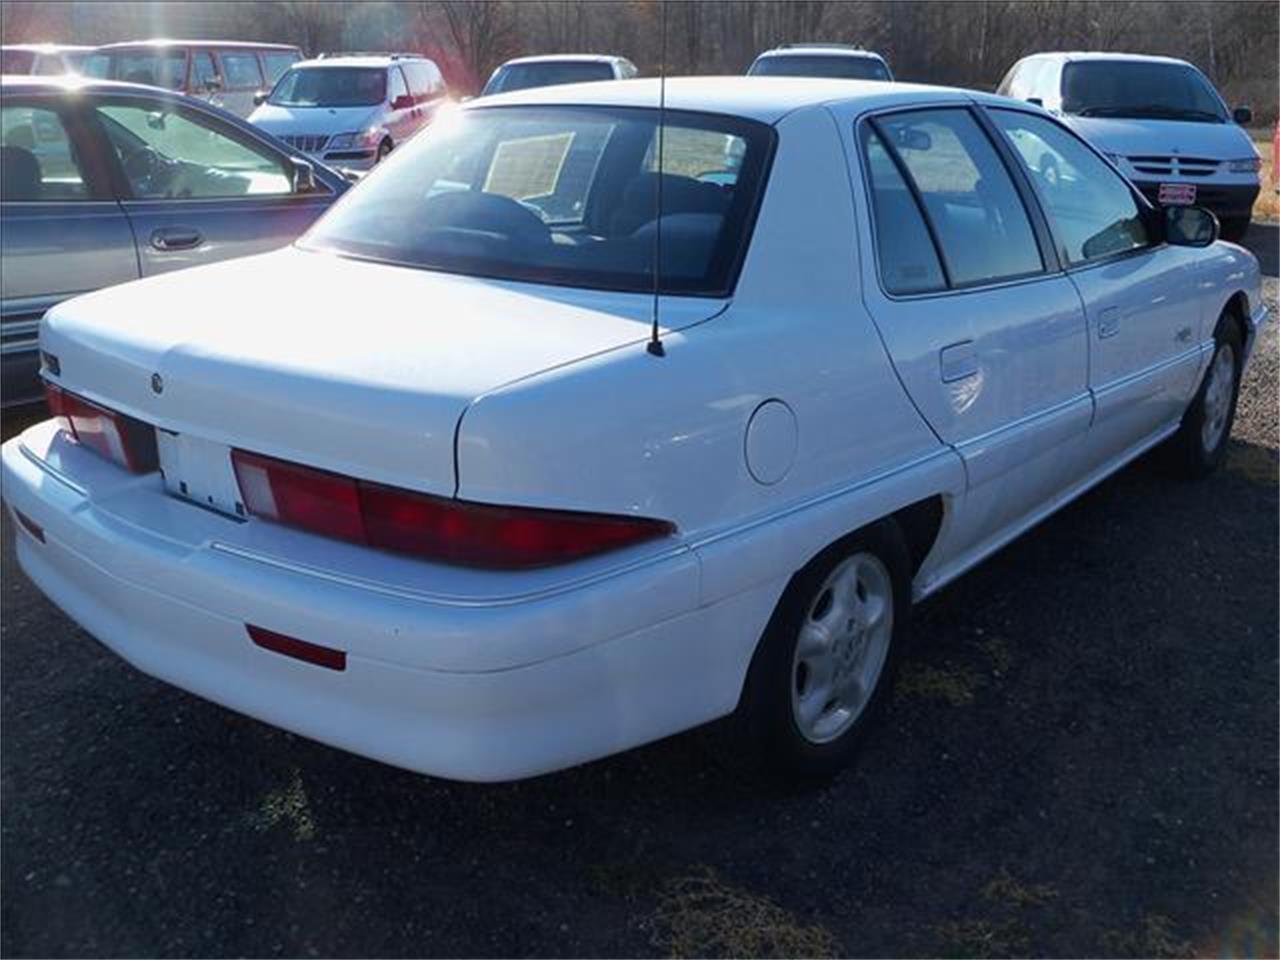 1998 Buick Skylark for Sale | ClassicCars.com | CC-768586